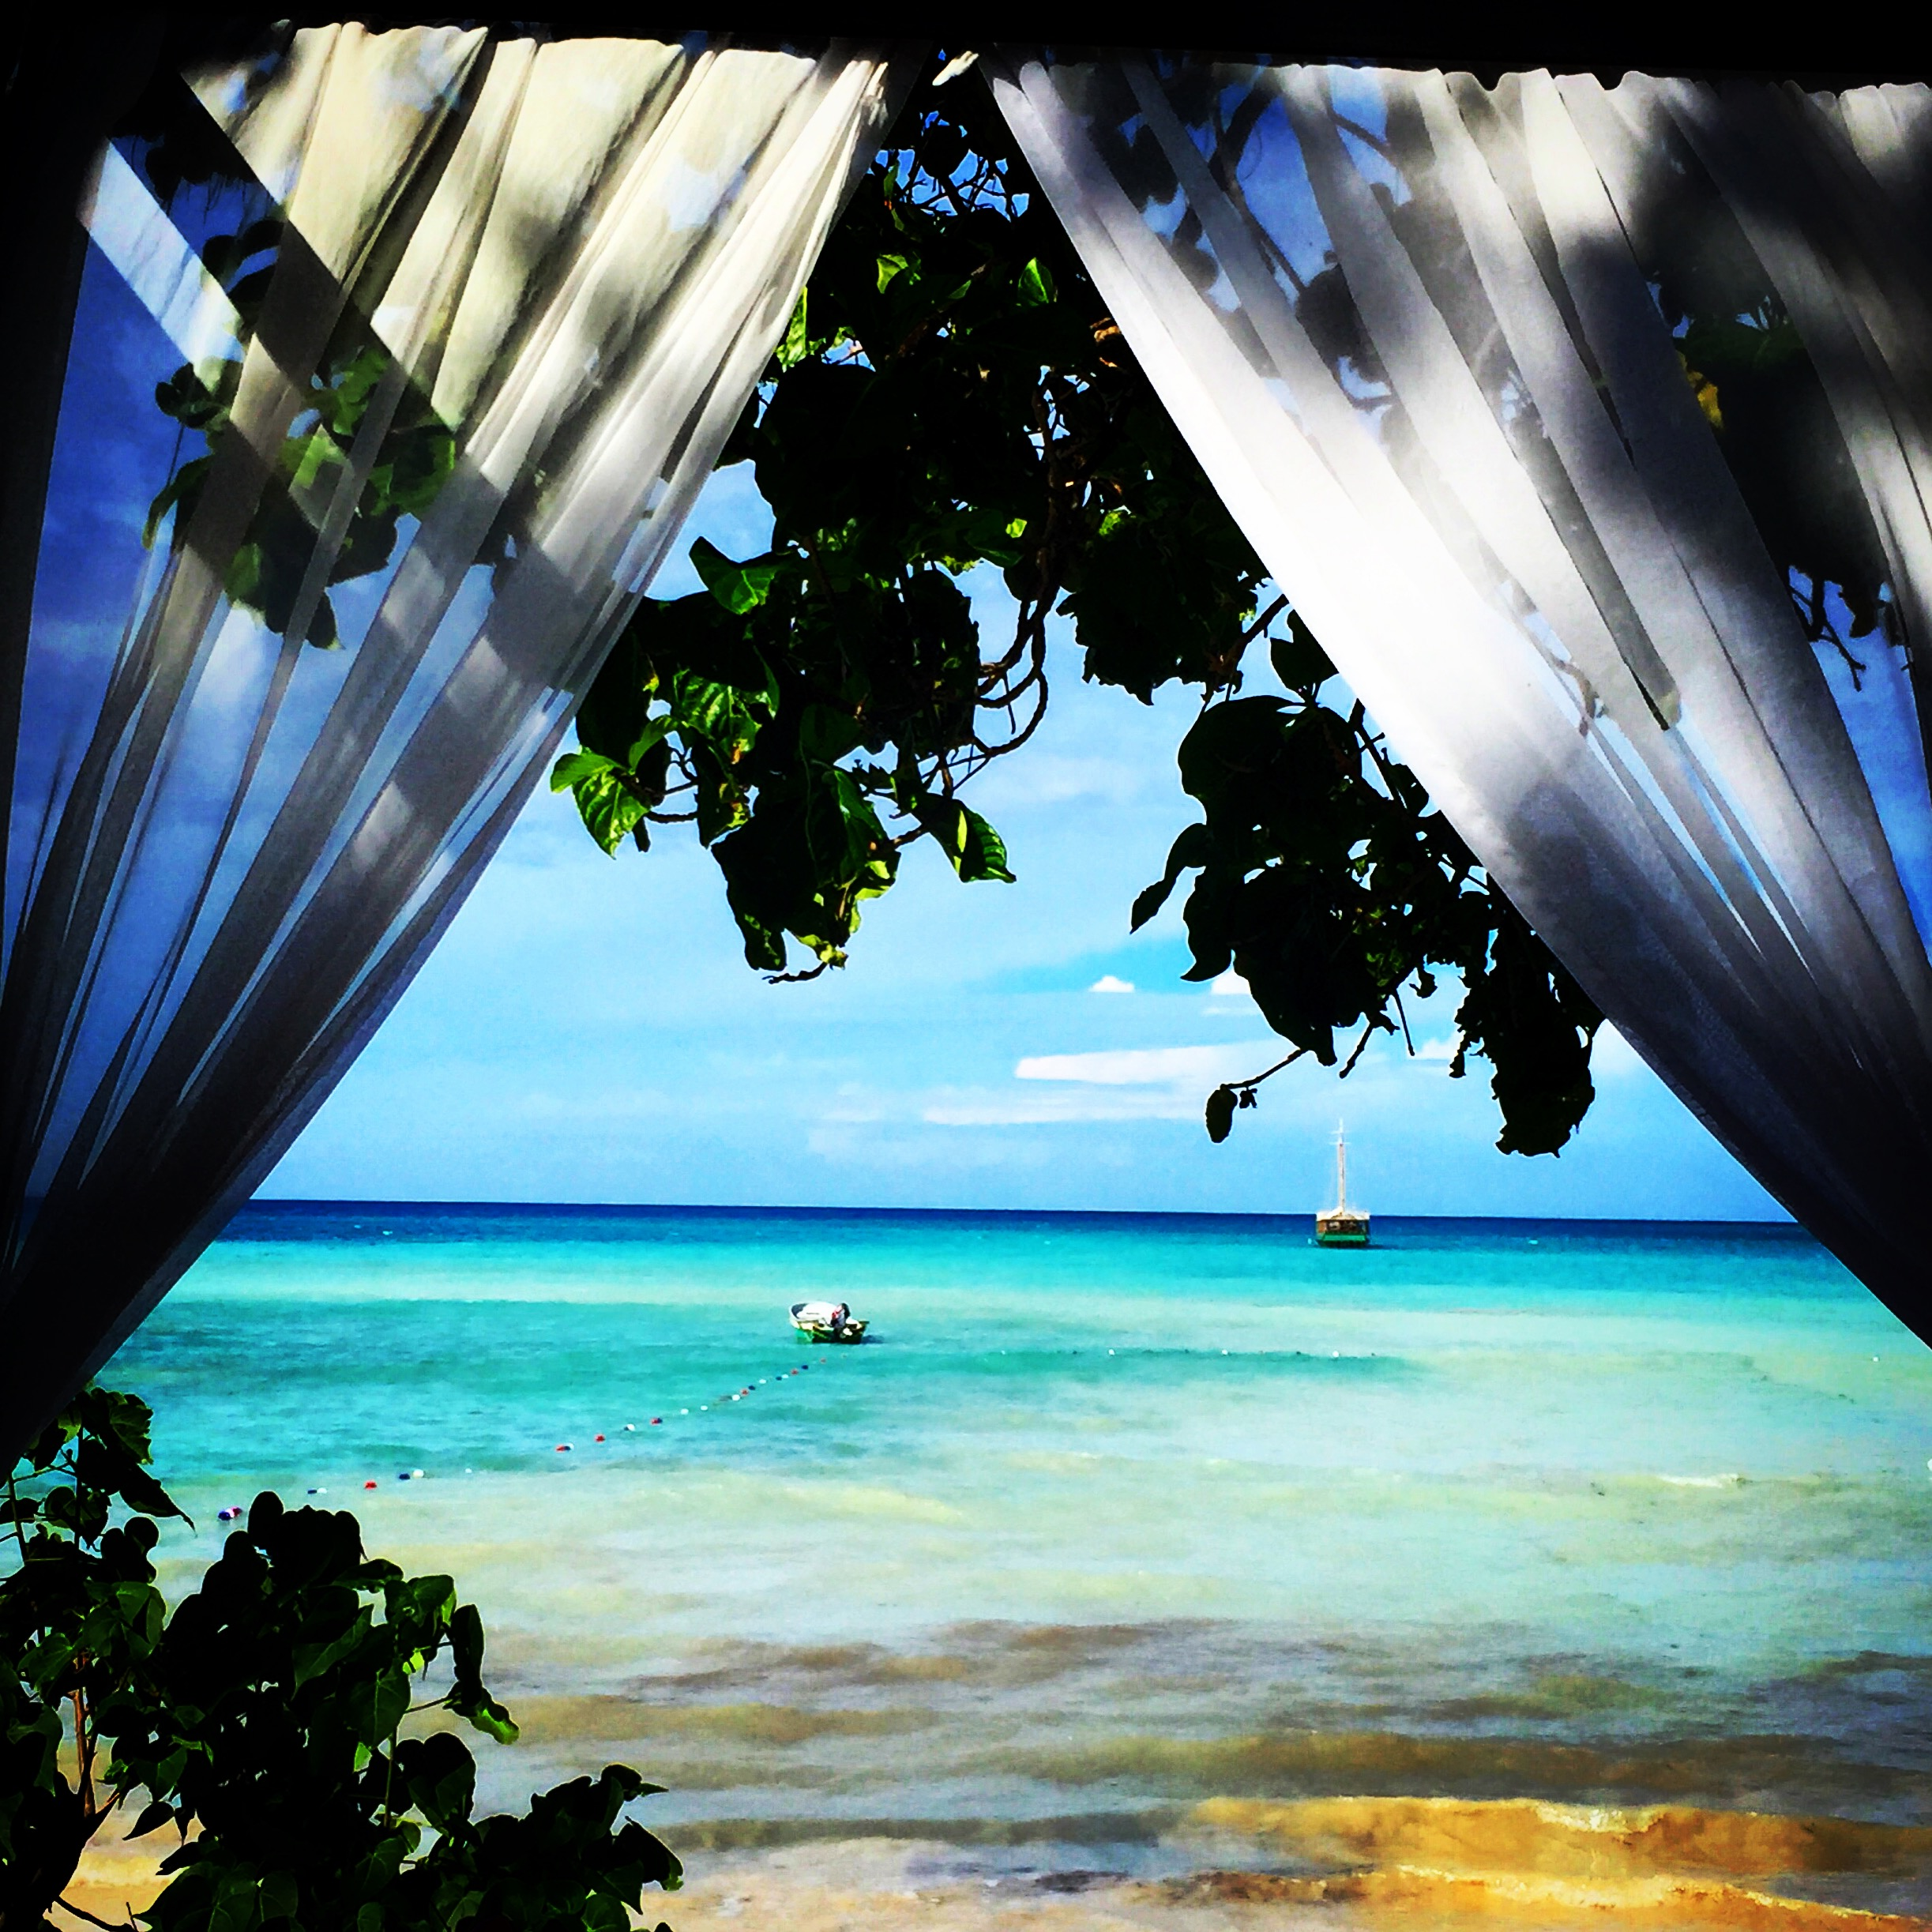 Paradise Island: Paradise Island, Cayo Arena, Dominican Republic : Gina Pacelli